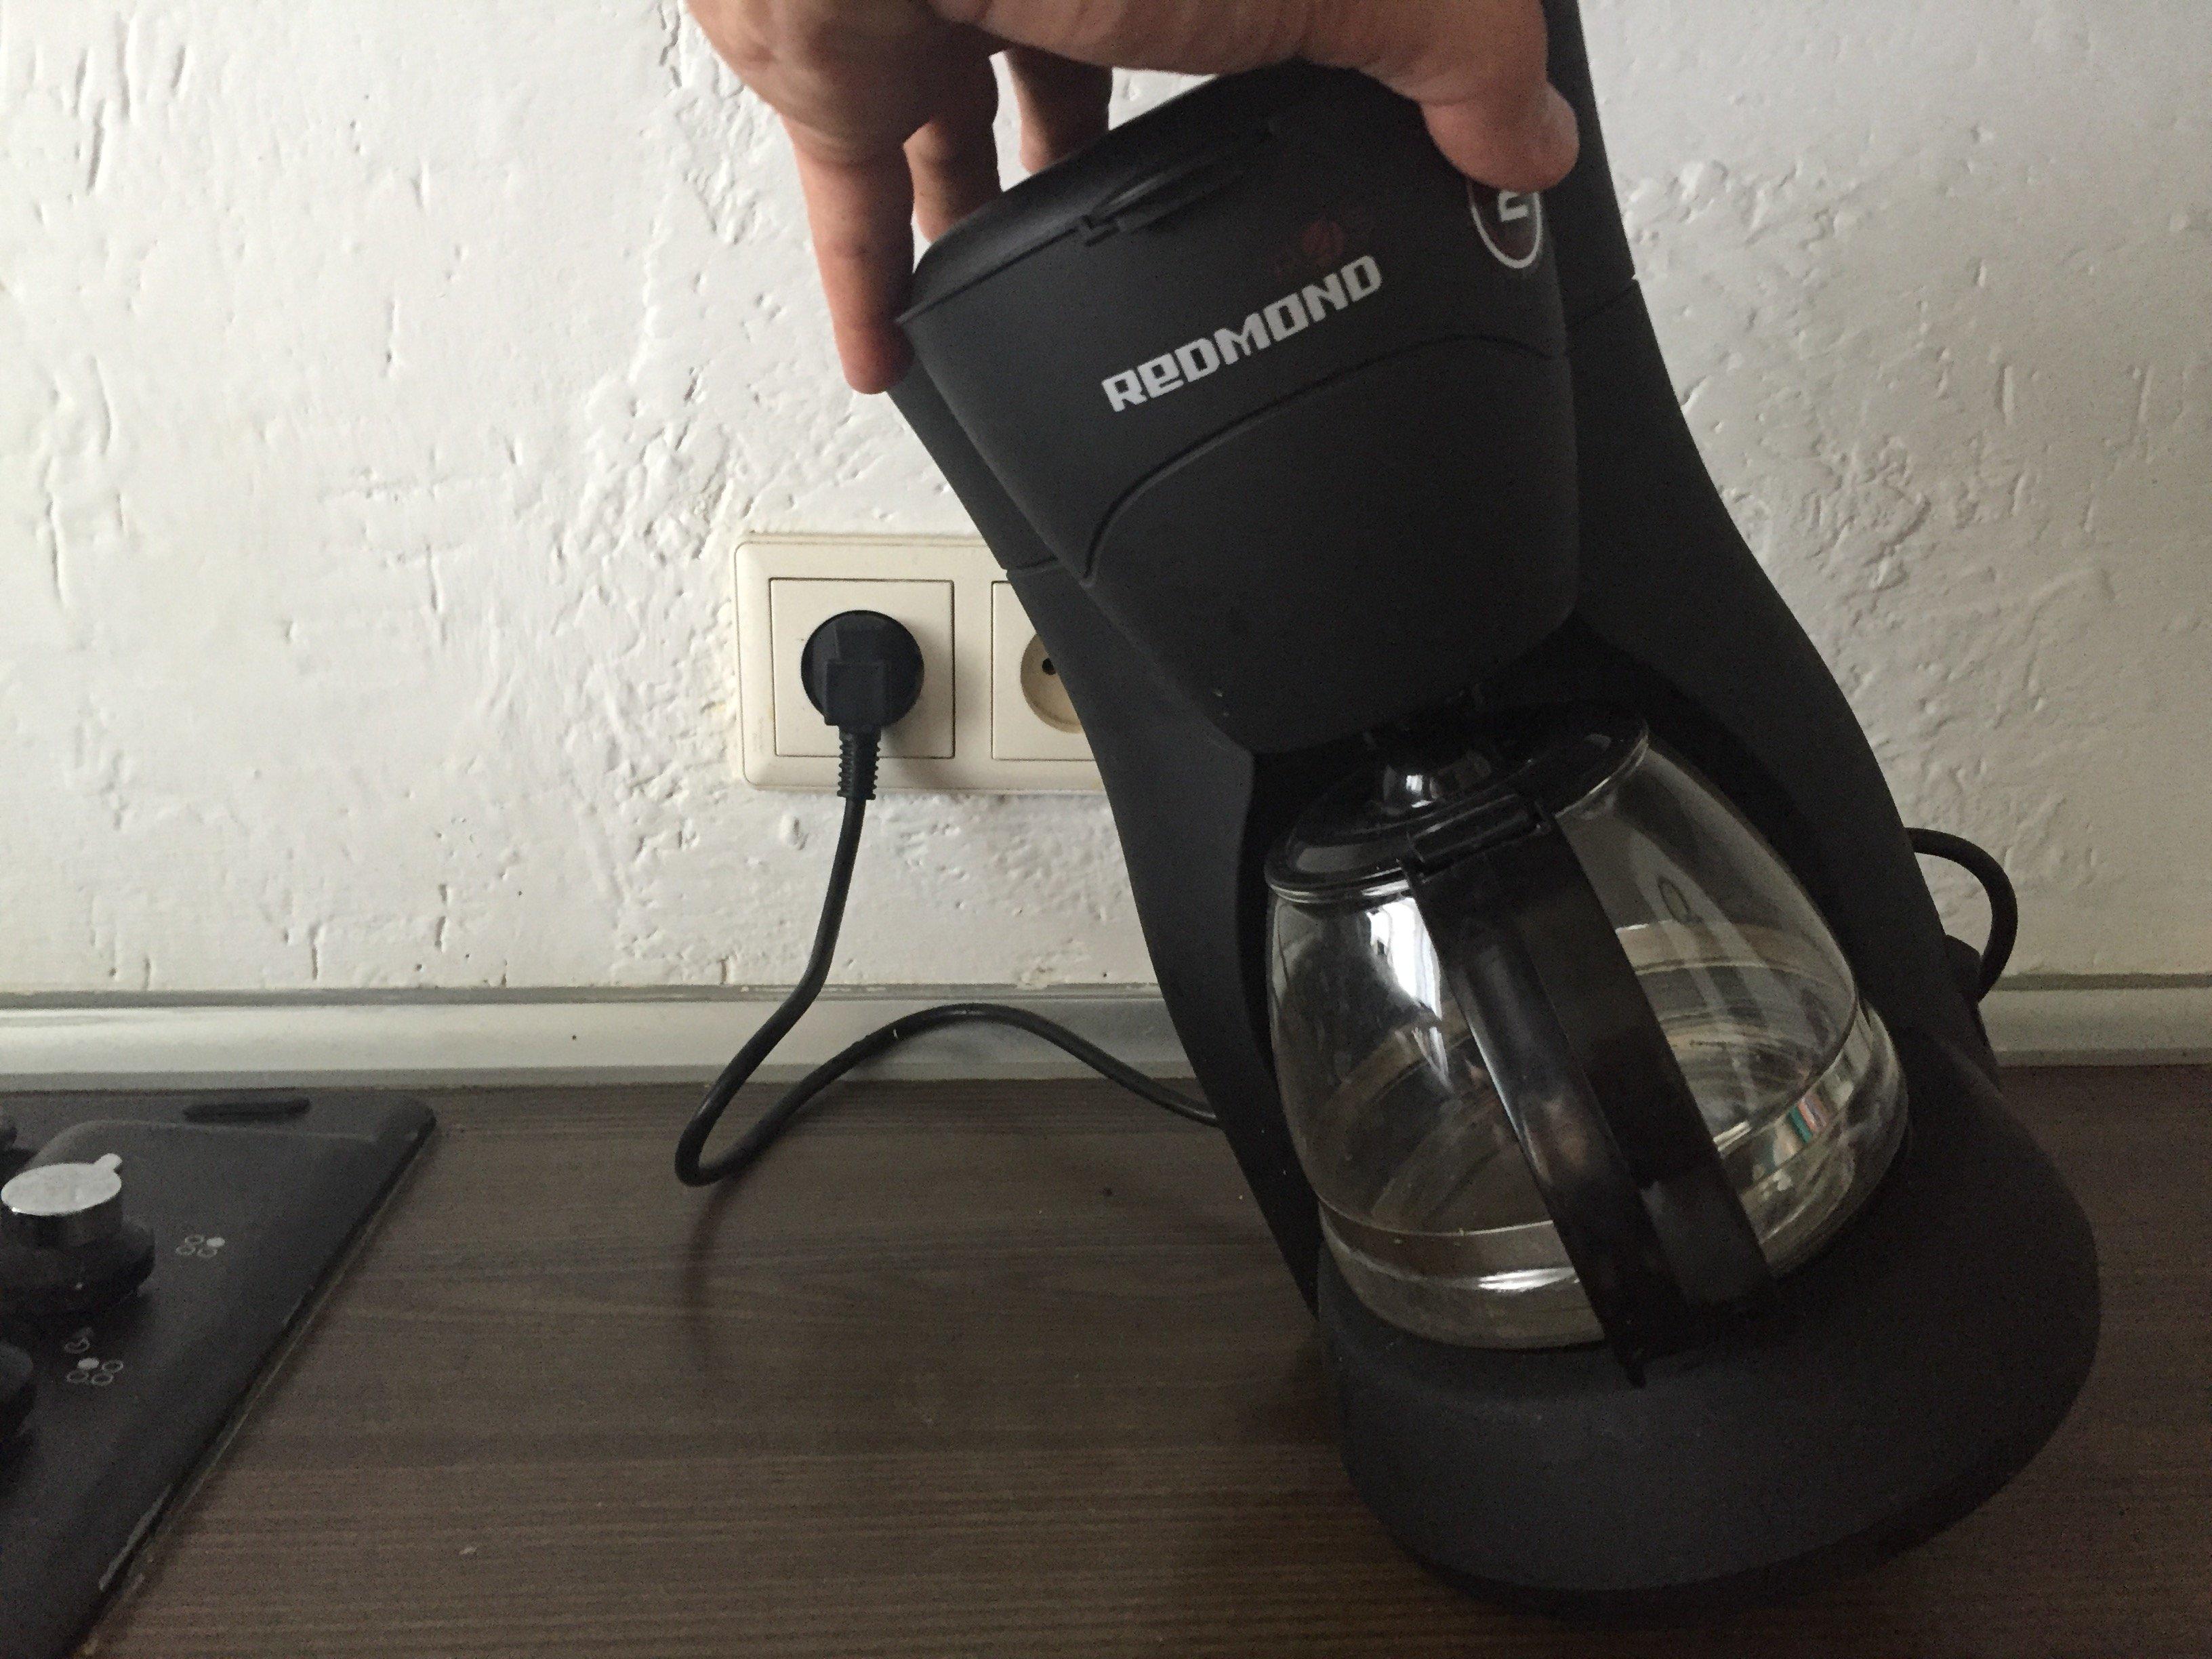 redmond smart teapot smart home умный дом редмонд техника обзор review